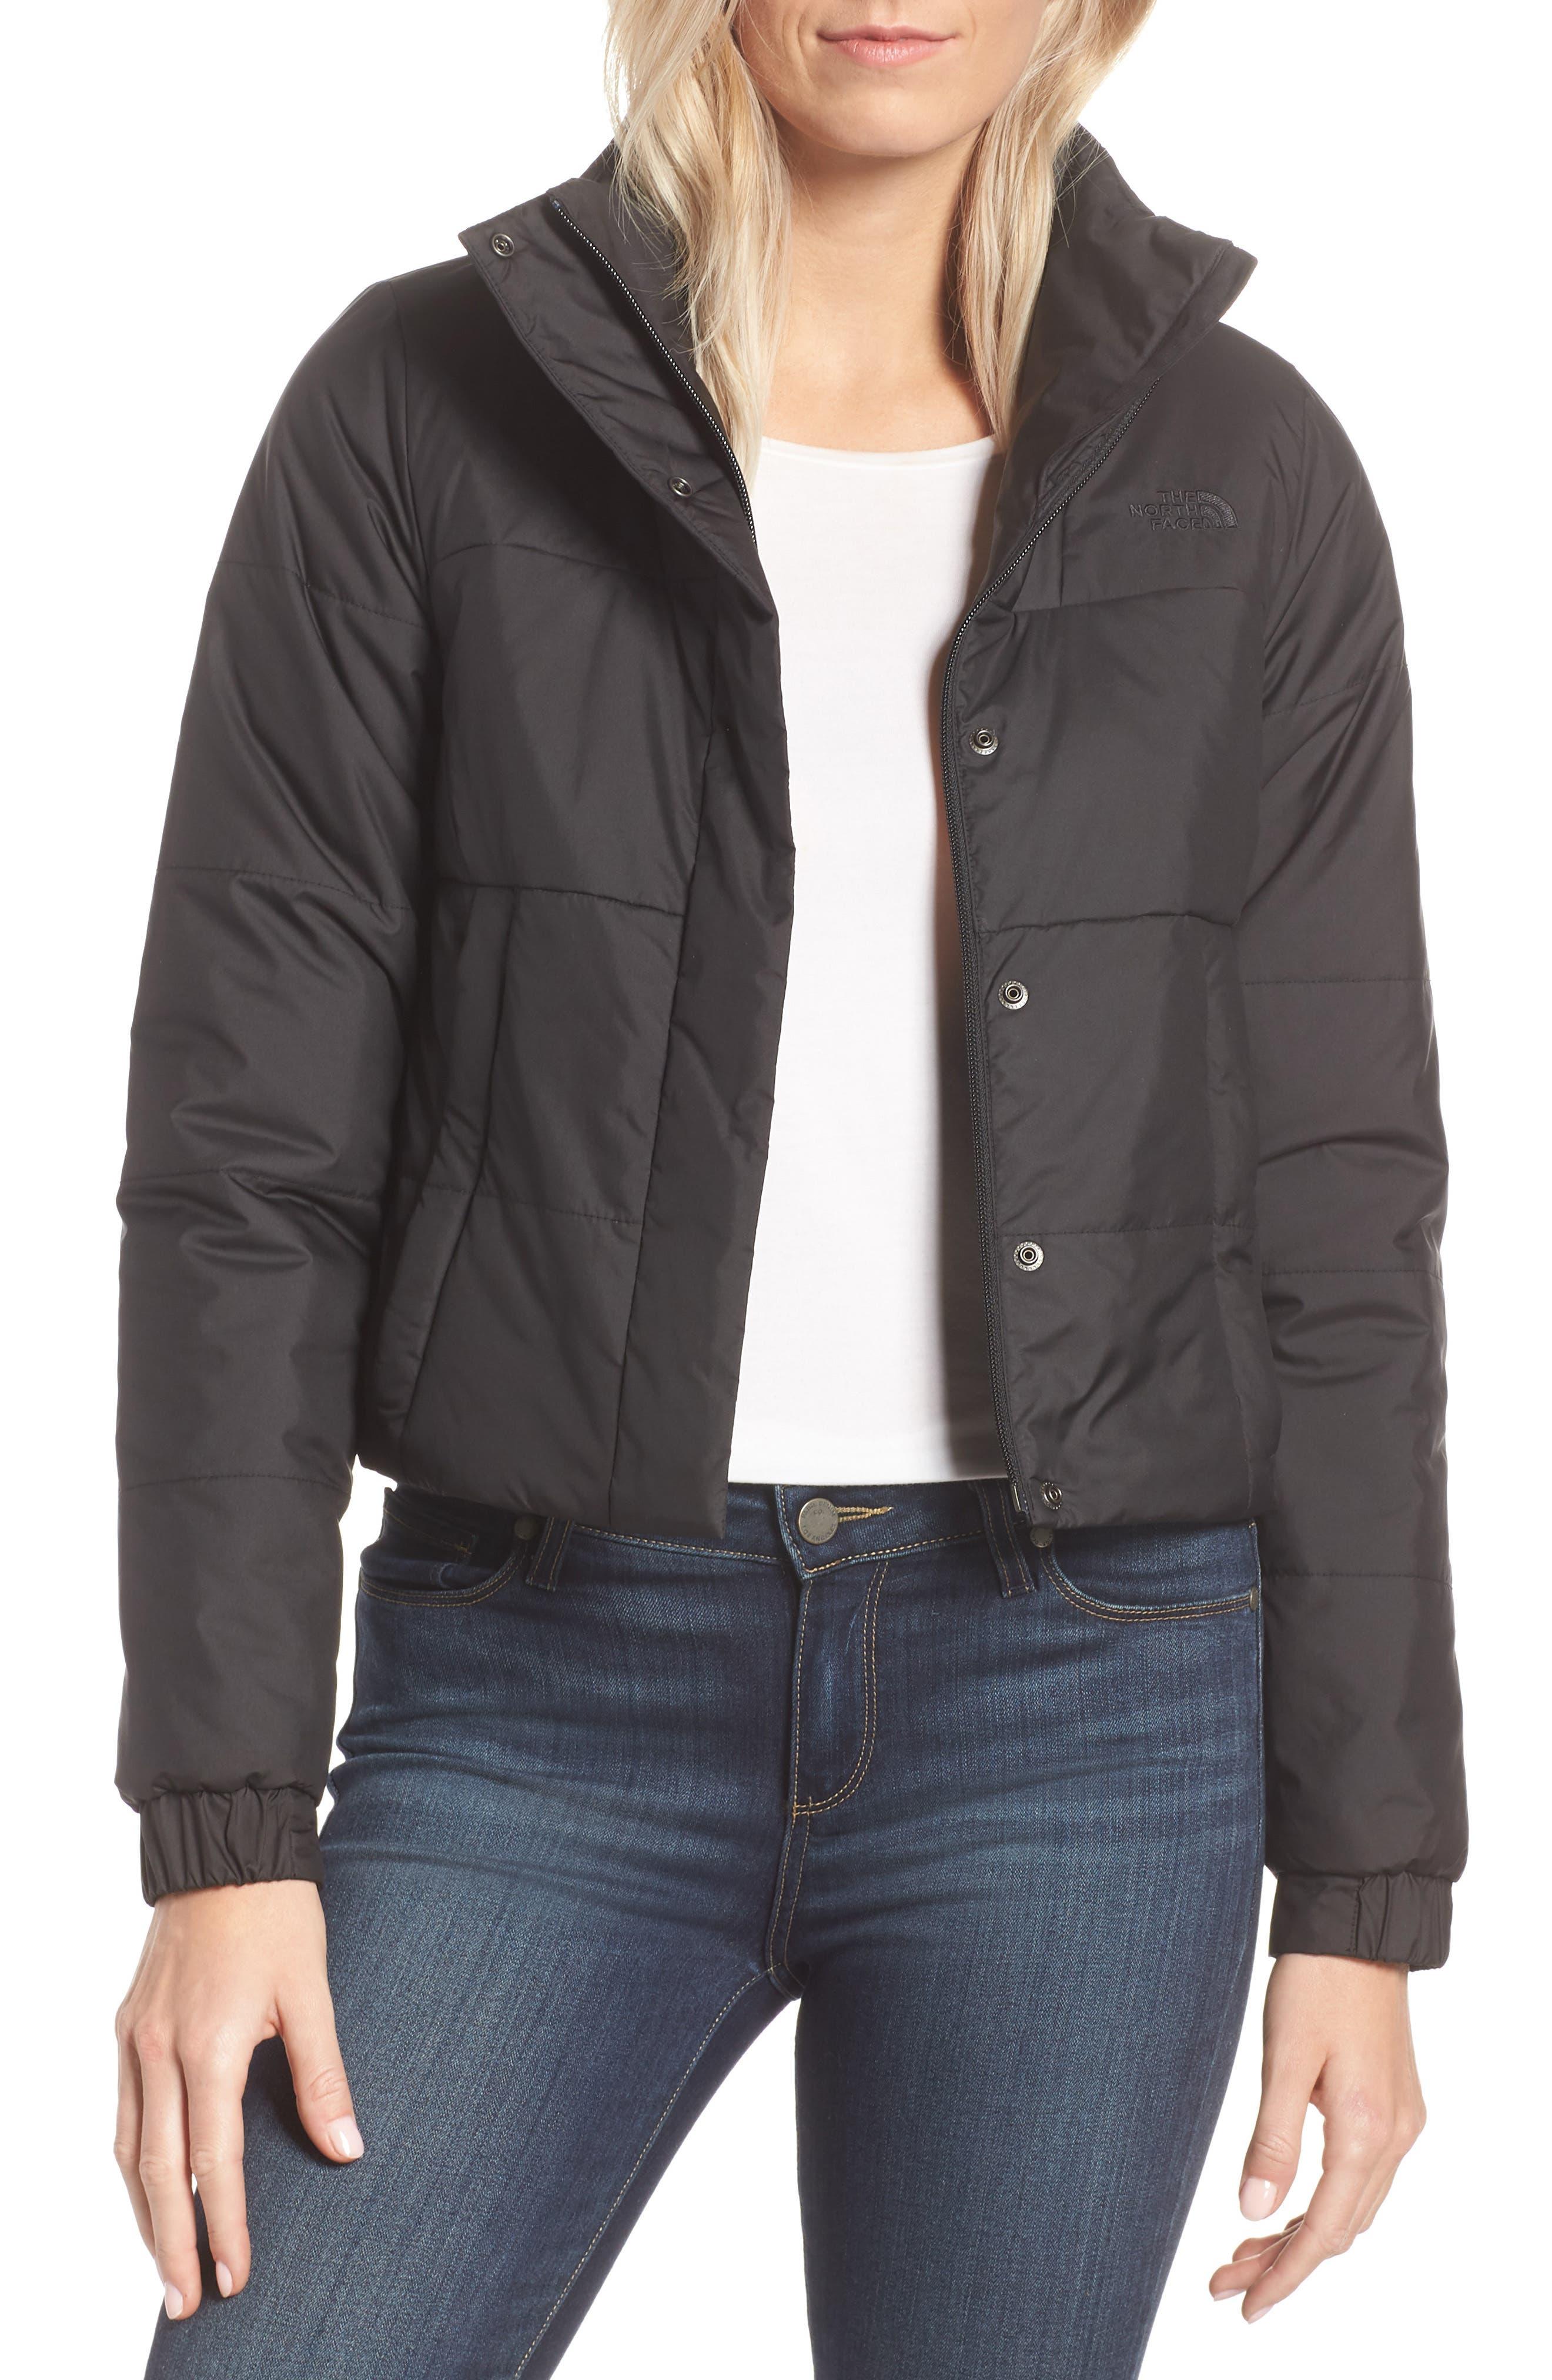 THE NORTH FACE, Femtastic Heatseeker Insulated Jacket, Main thumbnail 1, color, TNF BLACK